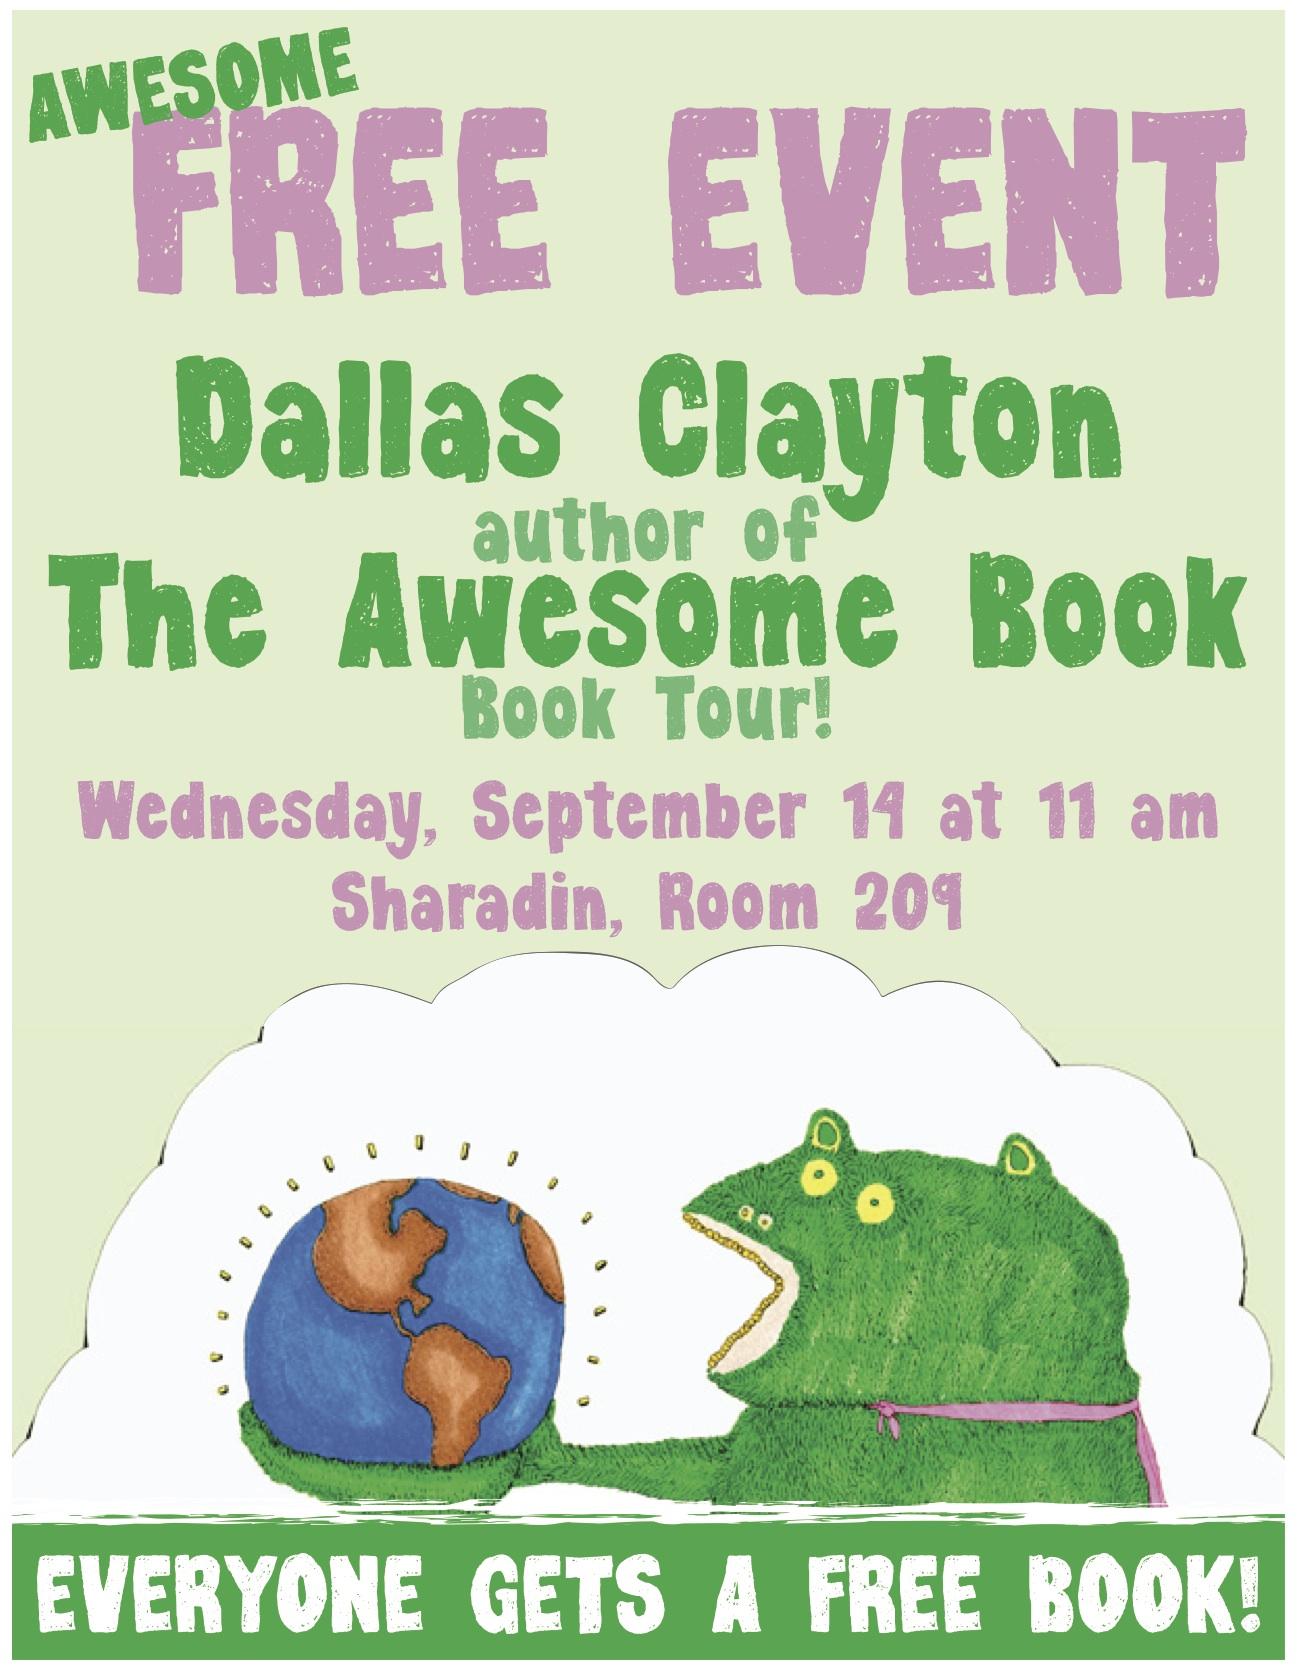 Dallas Clayton's